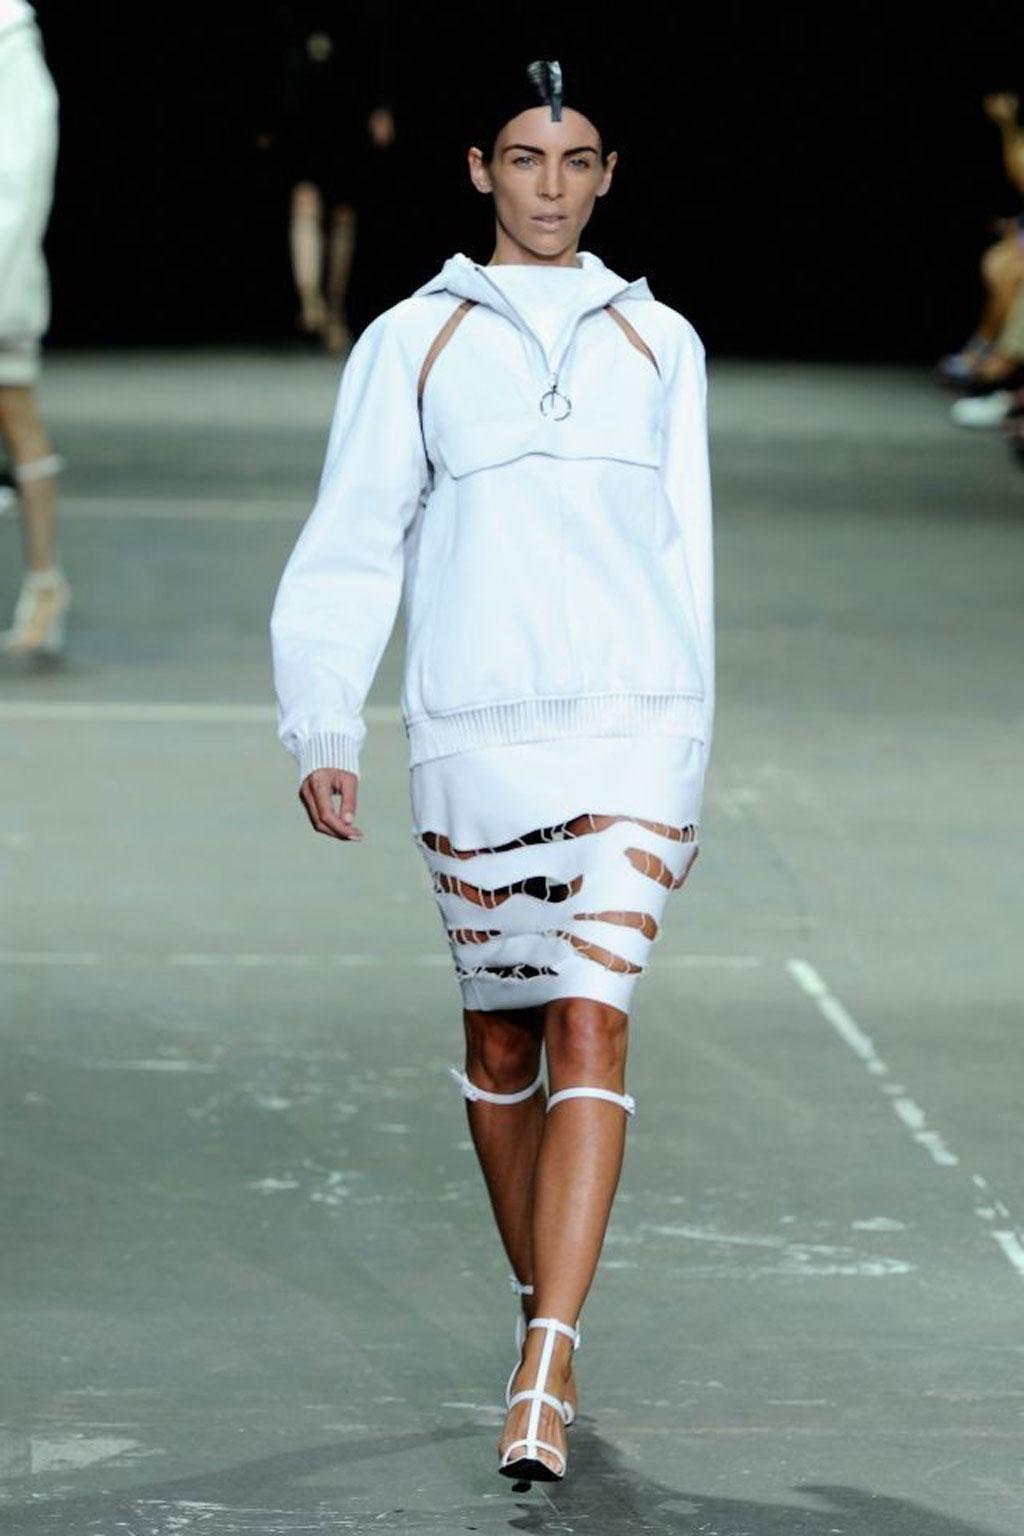 Liberty Ross walks the runway at the Alexander Wang Spring 2013 fashion show